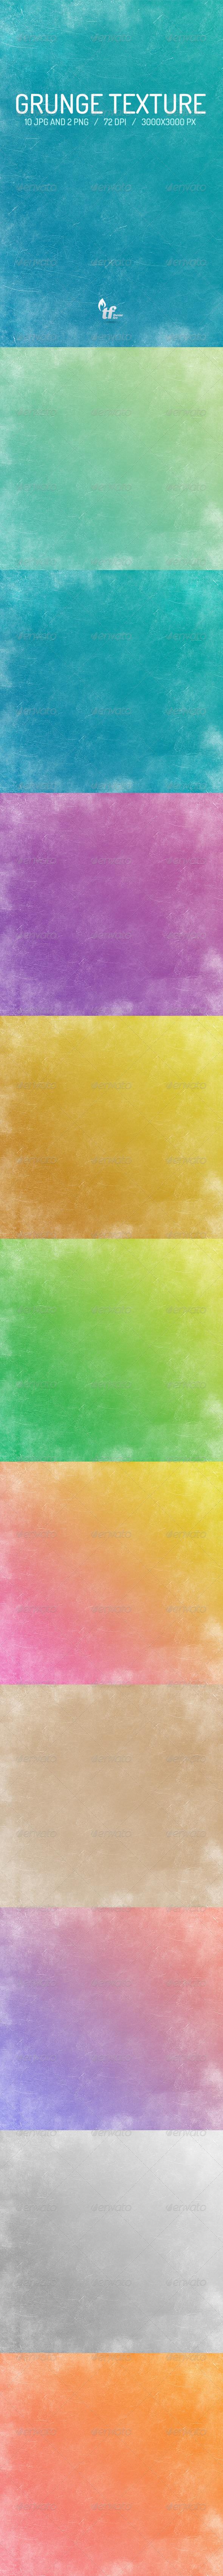 GraphicRiver Grunge Texture 6592732